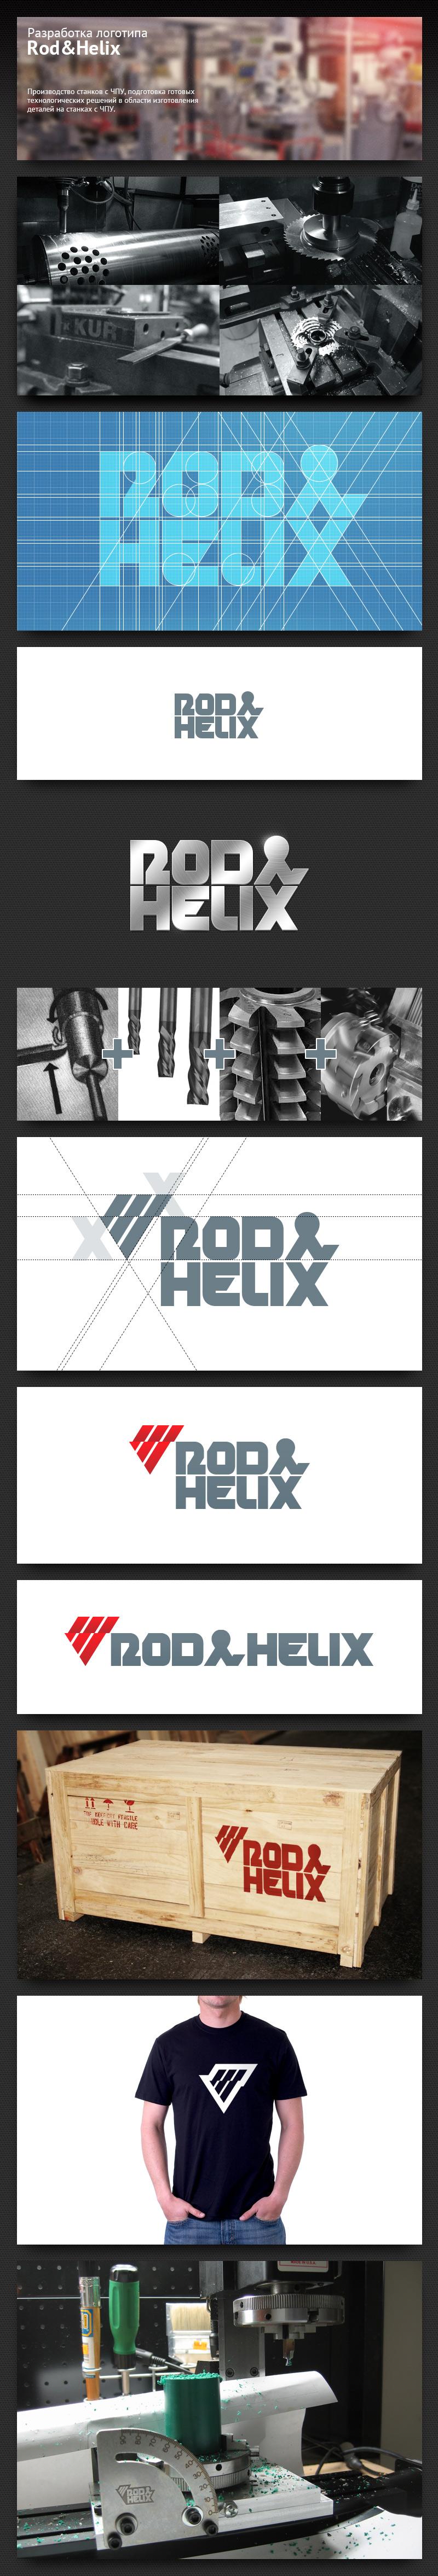 rod&helix